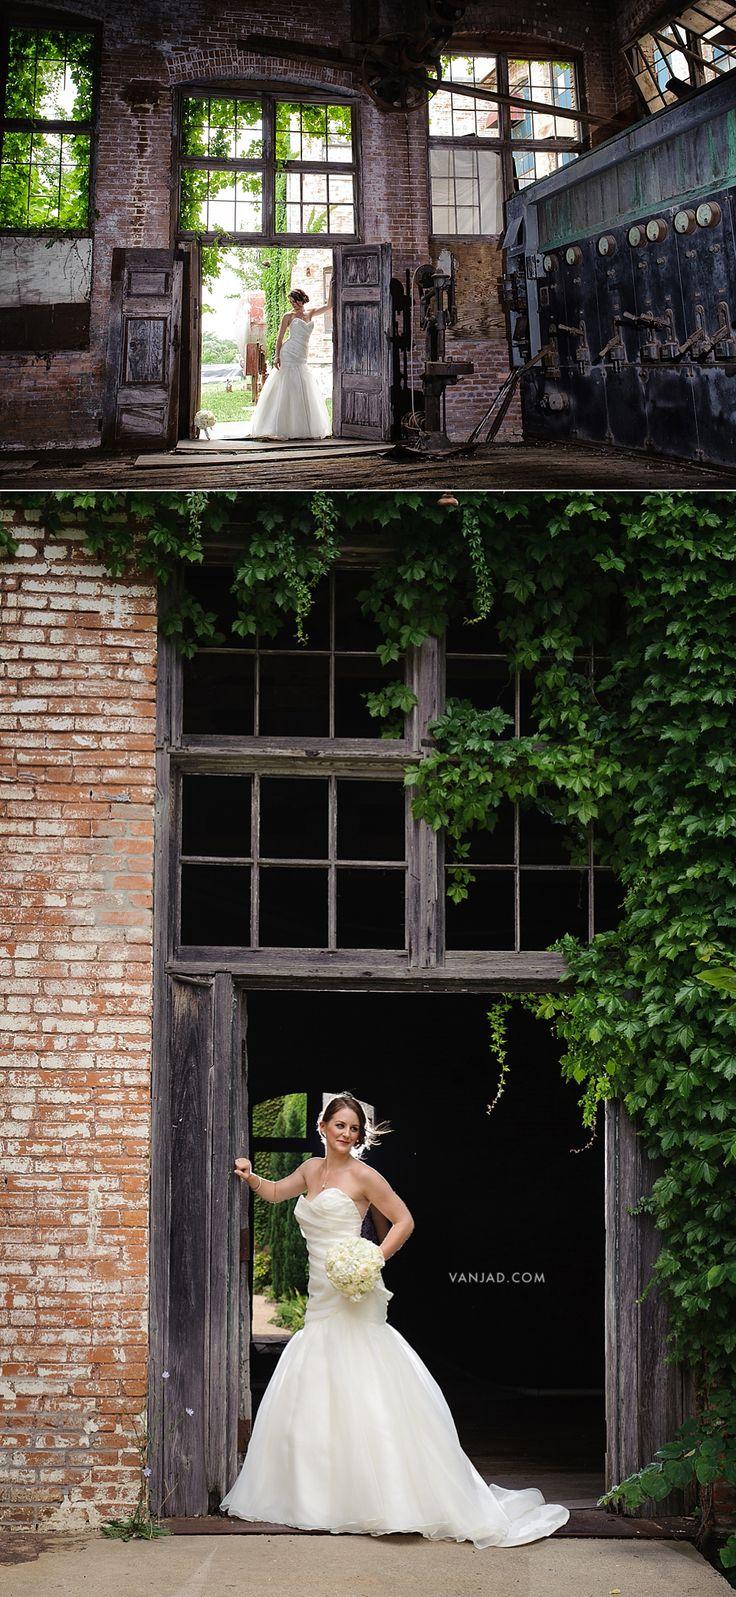 DALLAS WEDDING PHOTOGRAPHER | McKINNEY COTTON MILL | JULIE'S BRIDAL SESSION